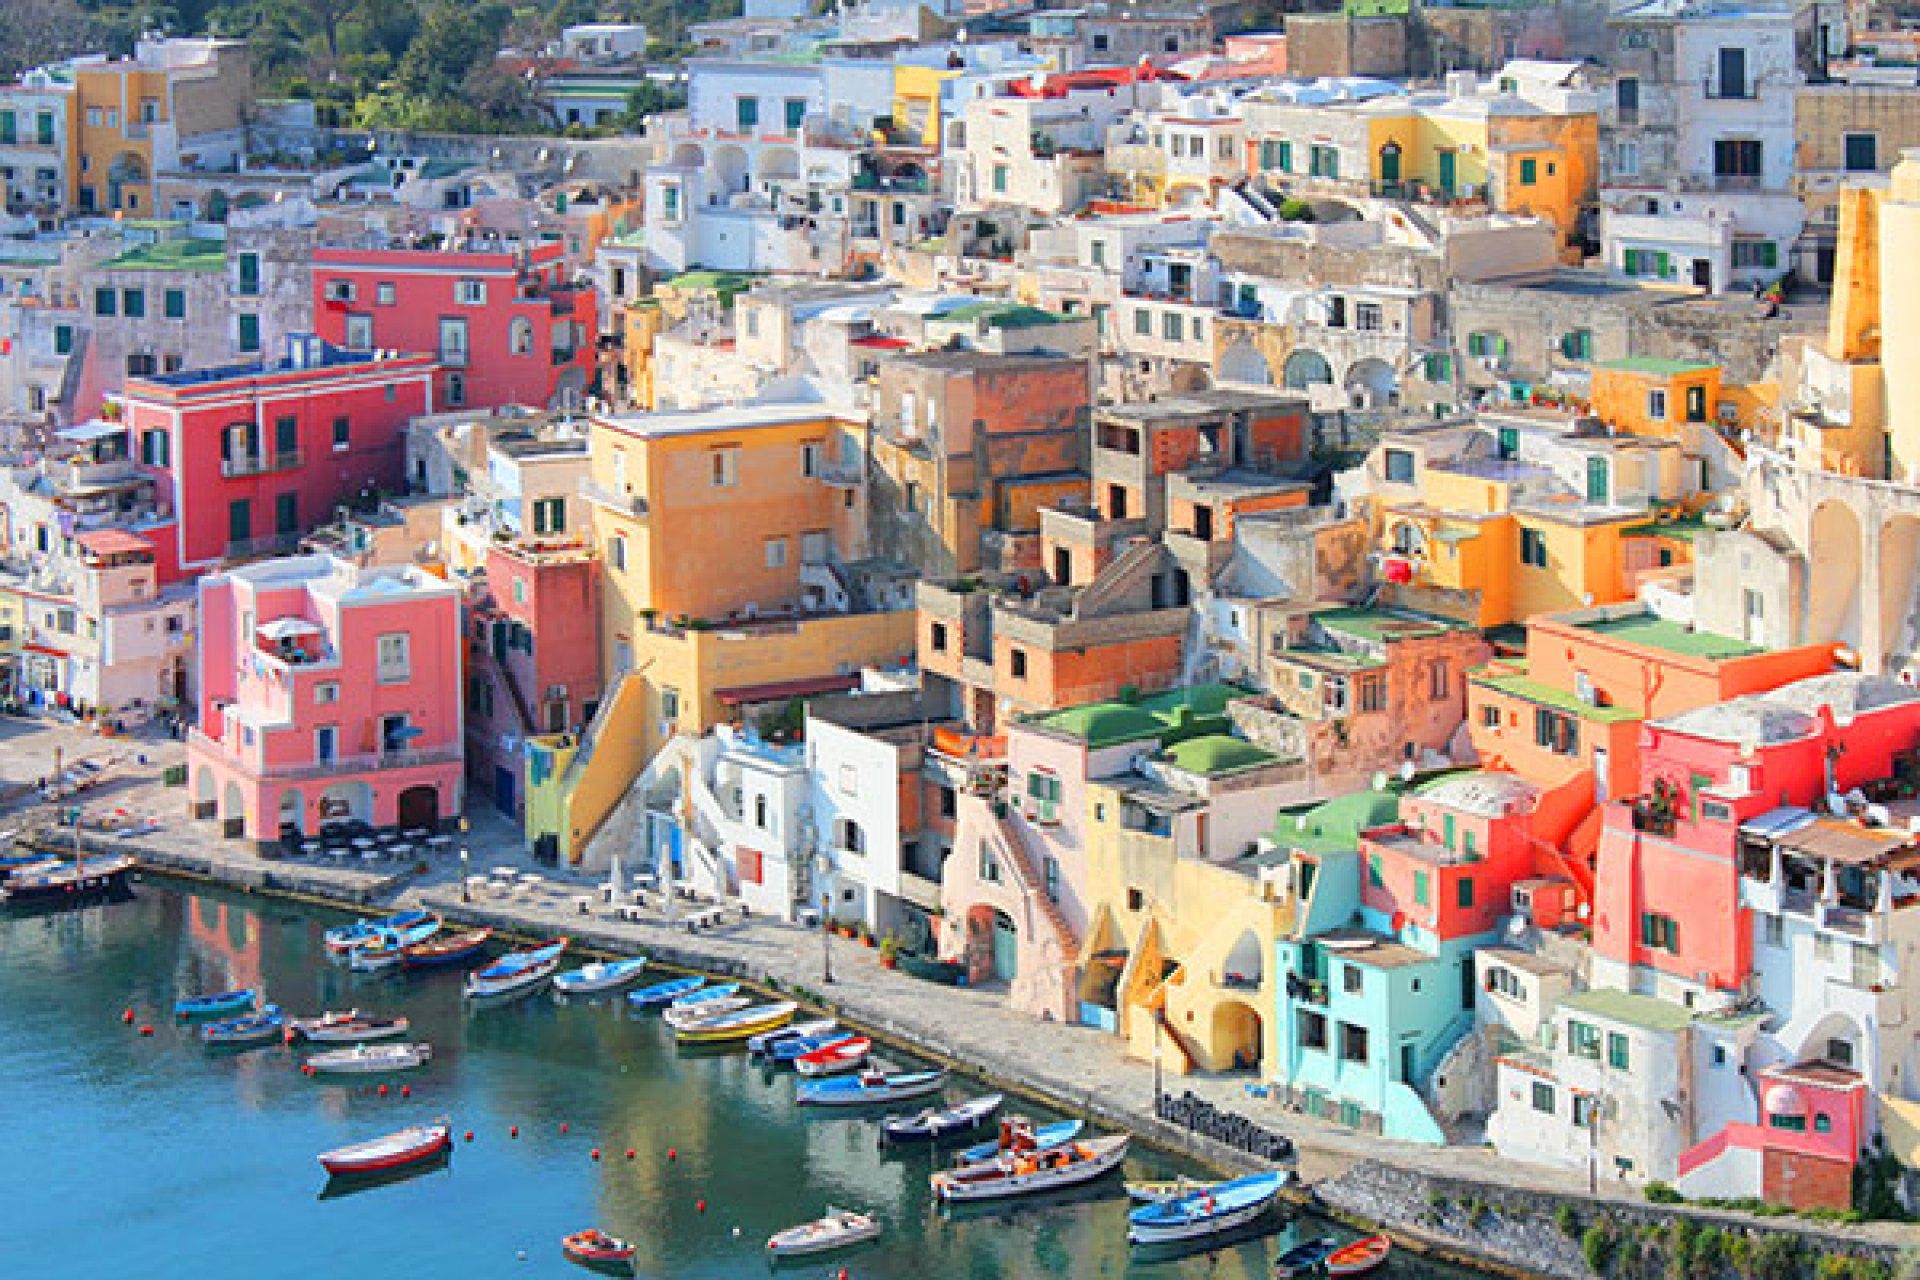 The Italian island of Procida.